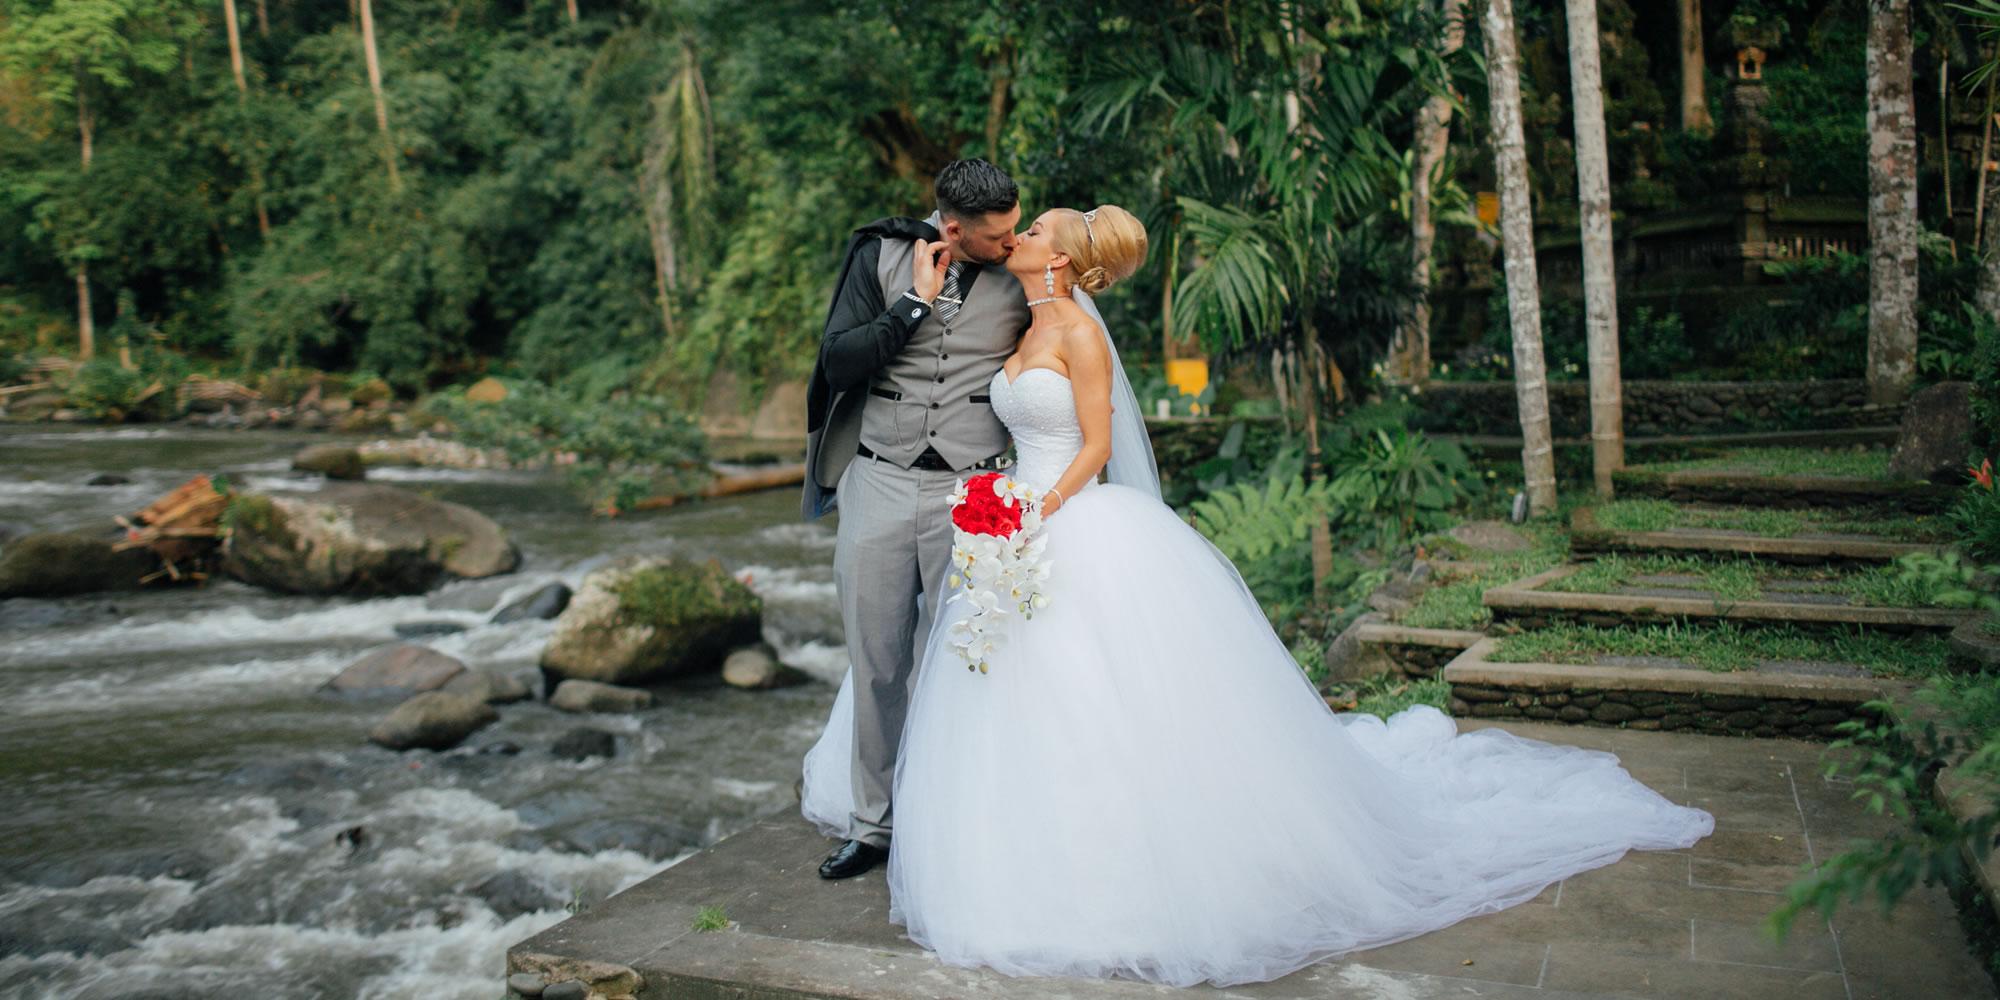 Patrick and elke wedding Royal Pitamaha